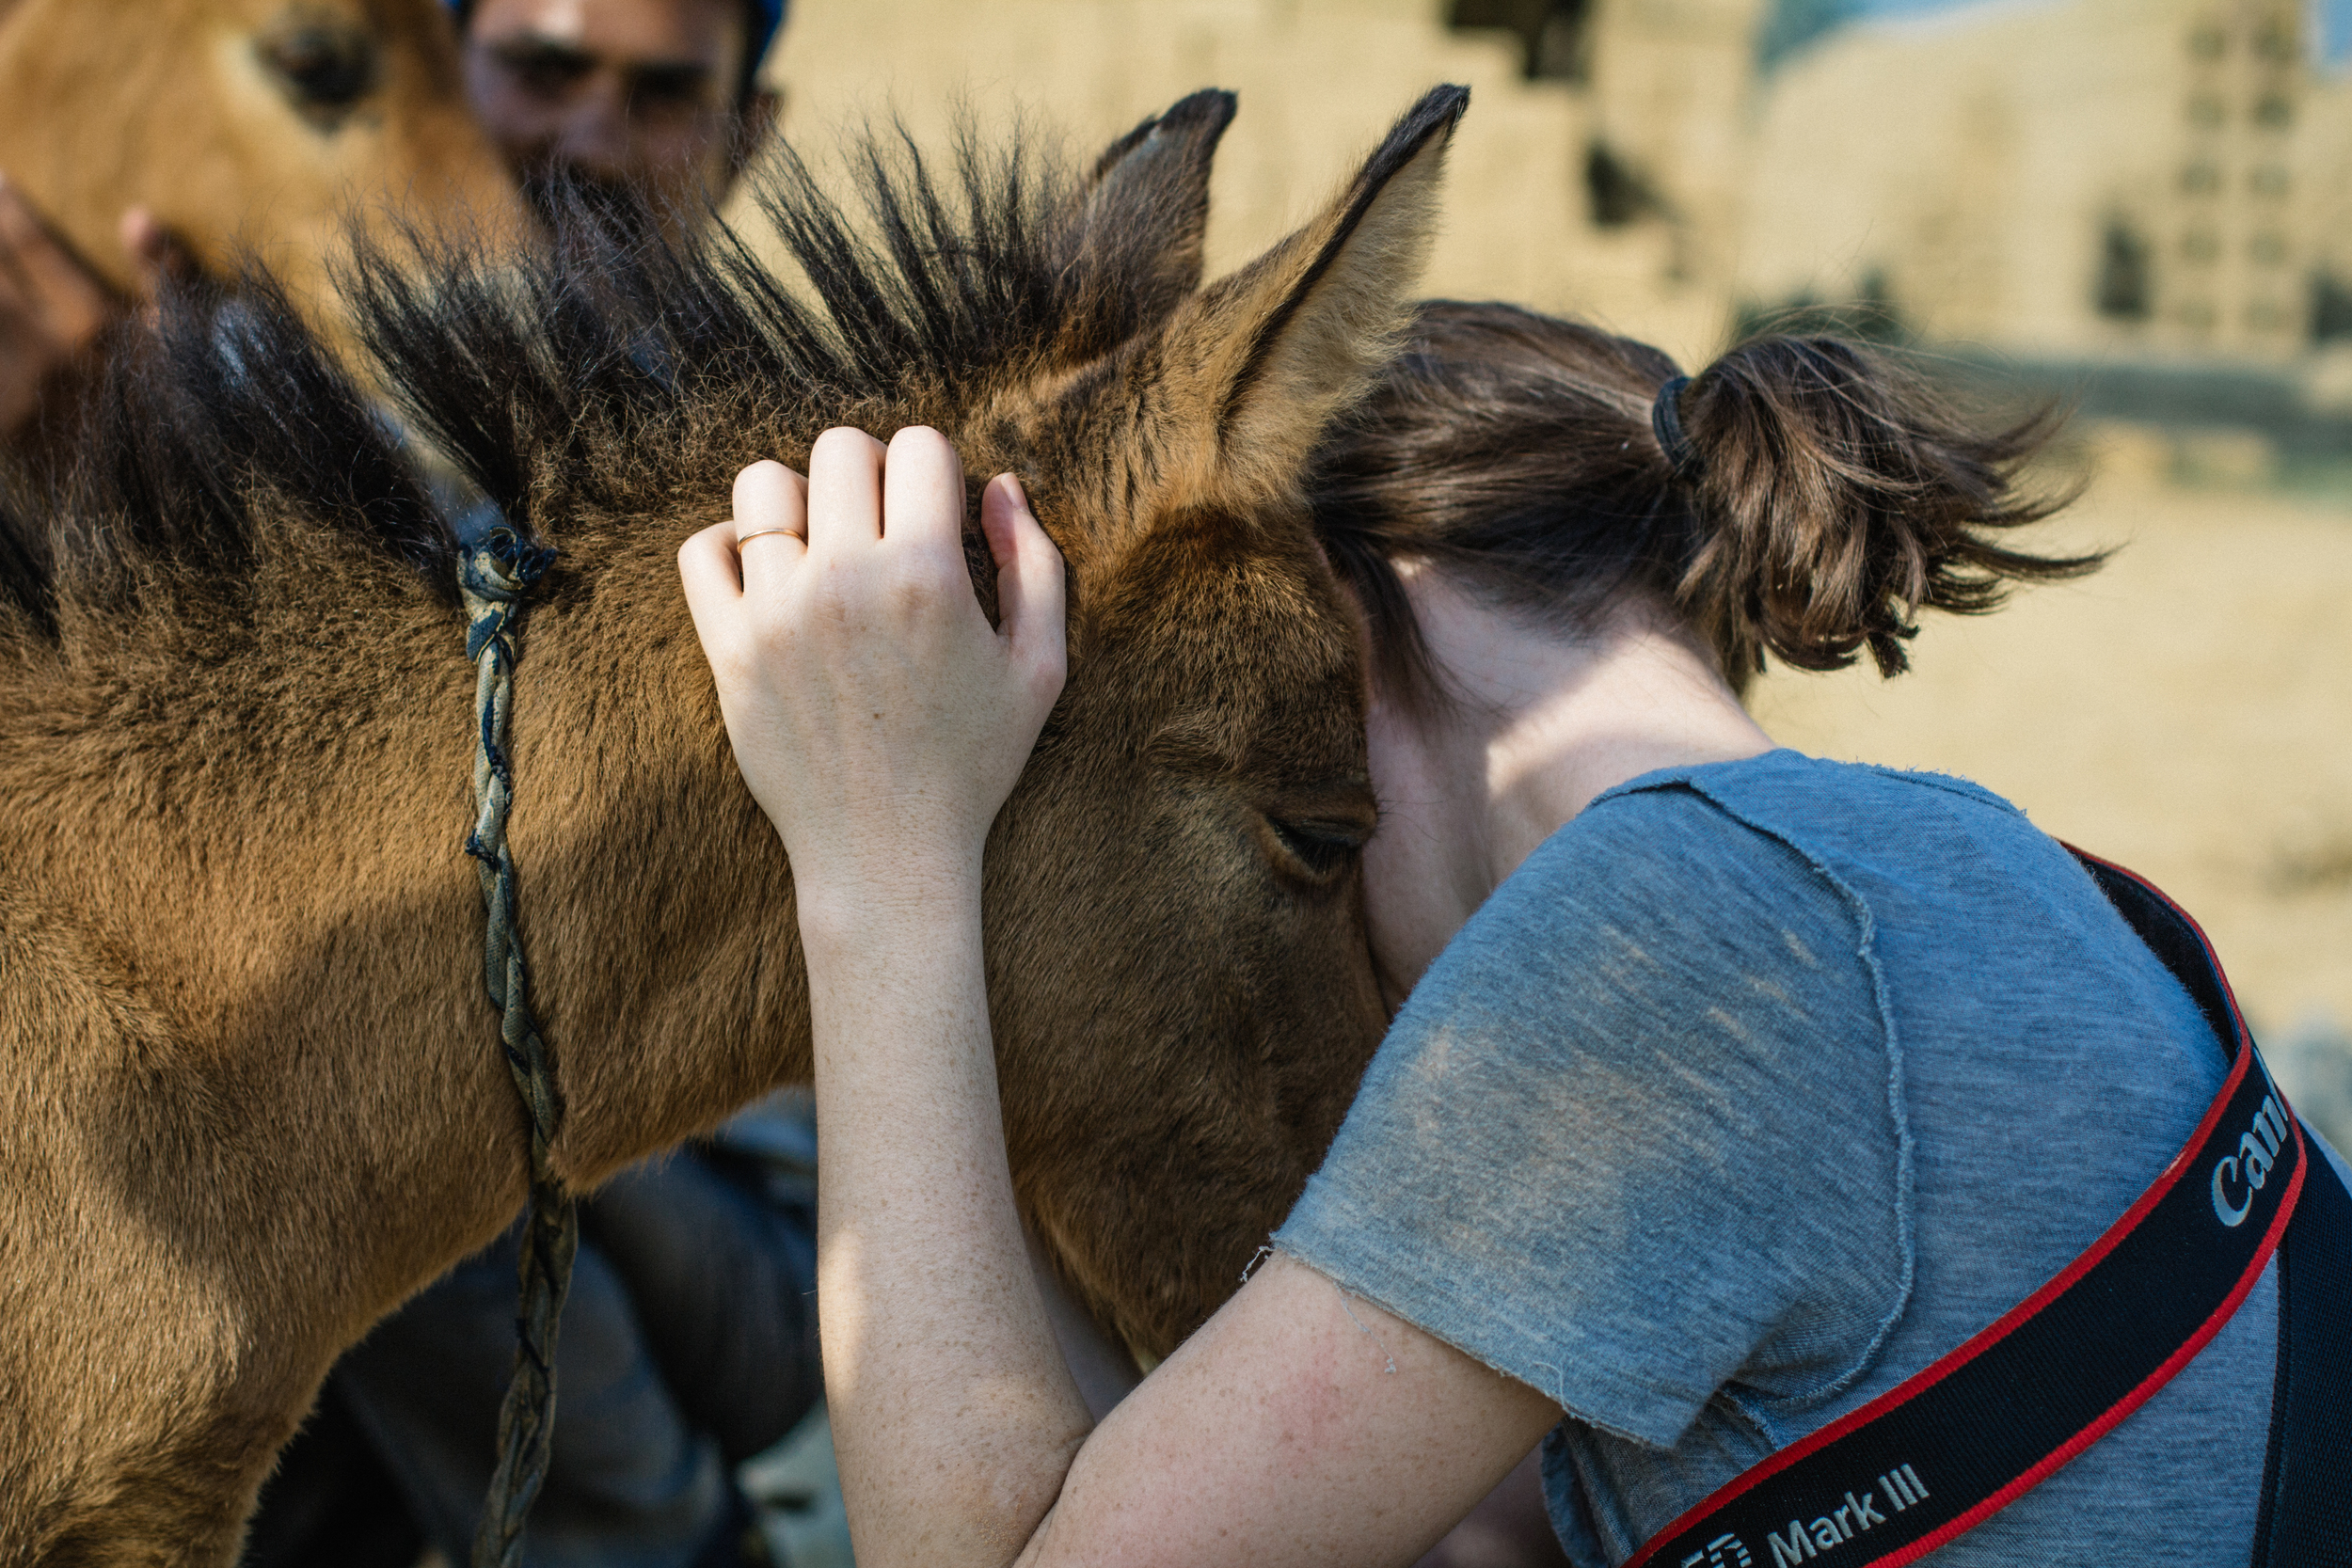 Foals in India